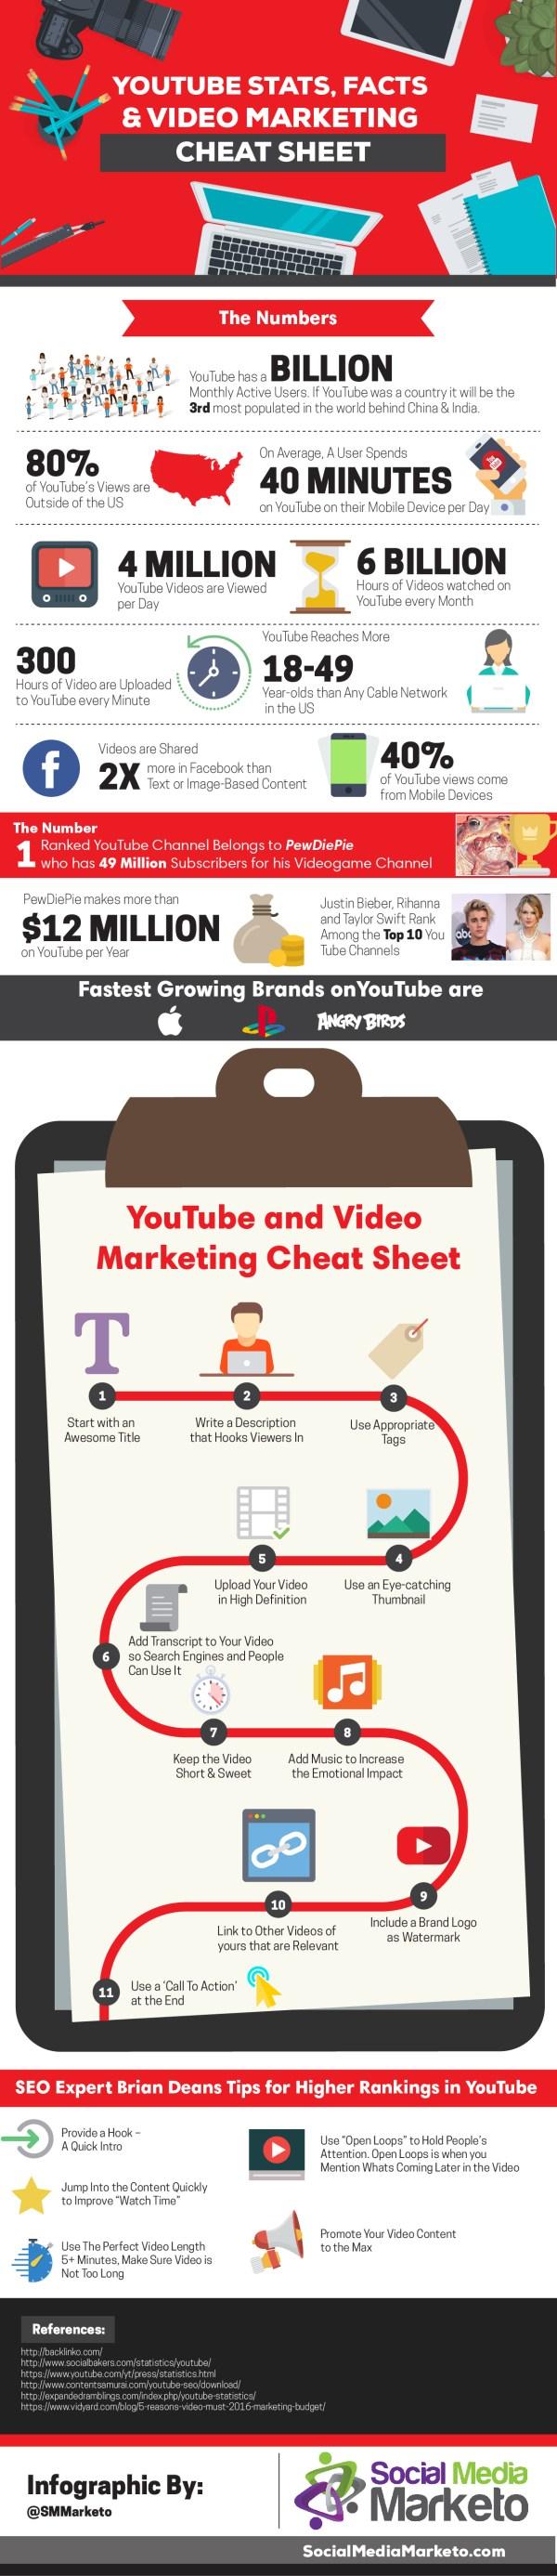 YouTube Marketing Cheat Sheet [Infographic]